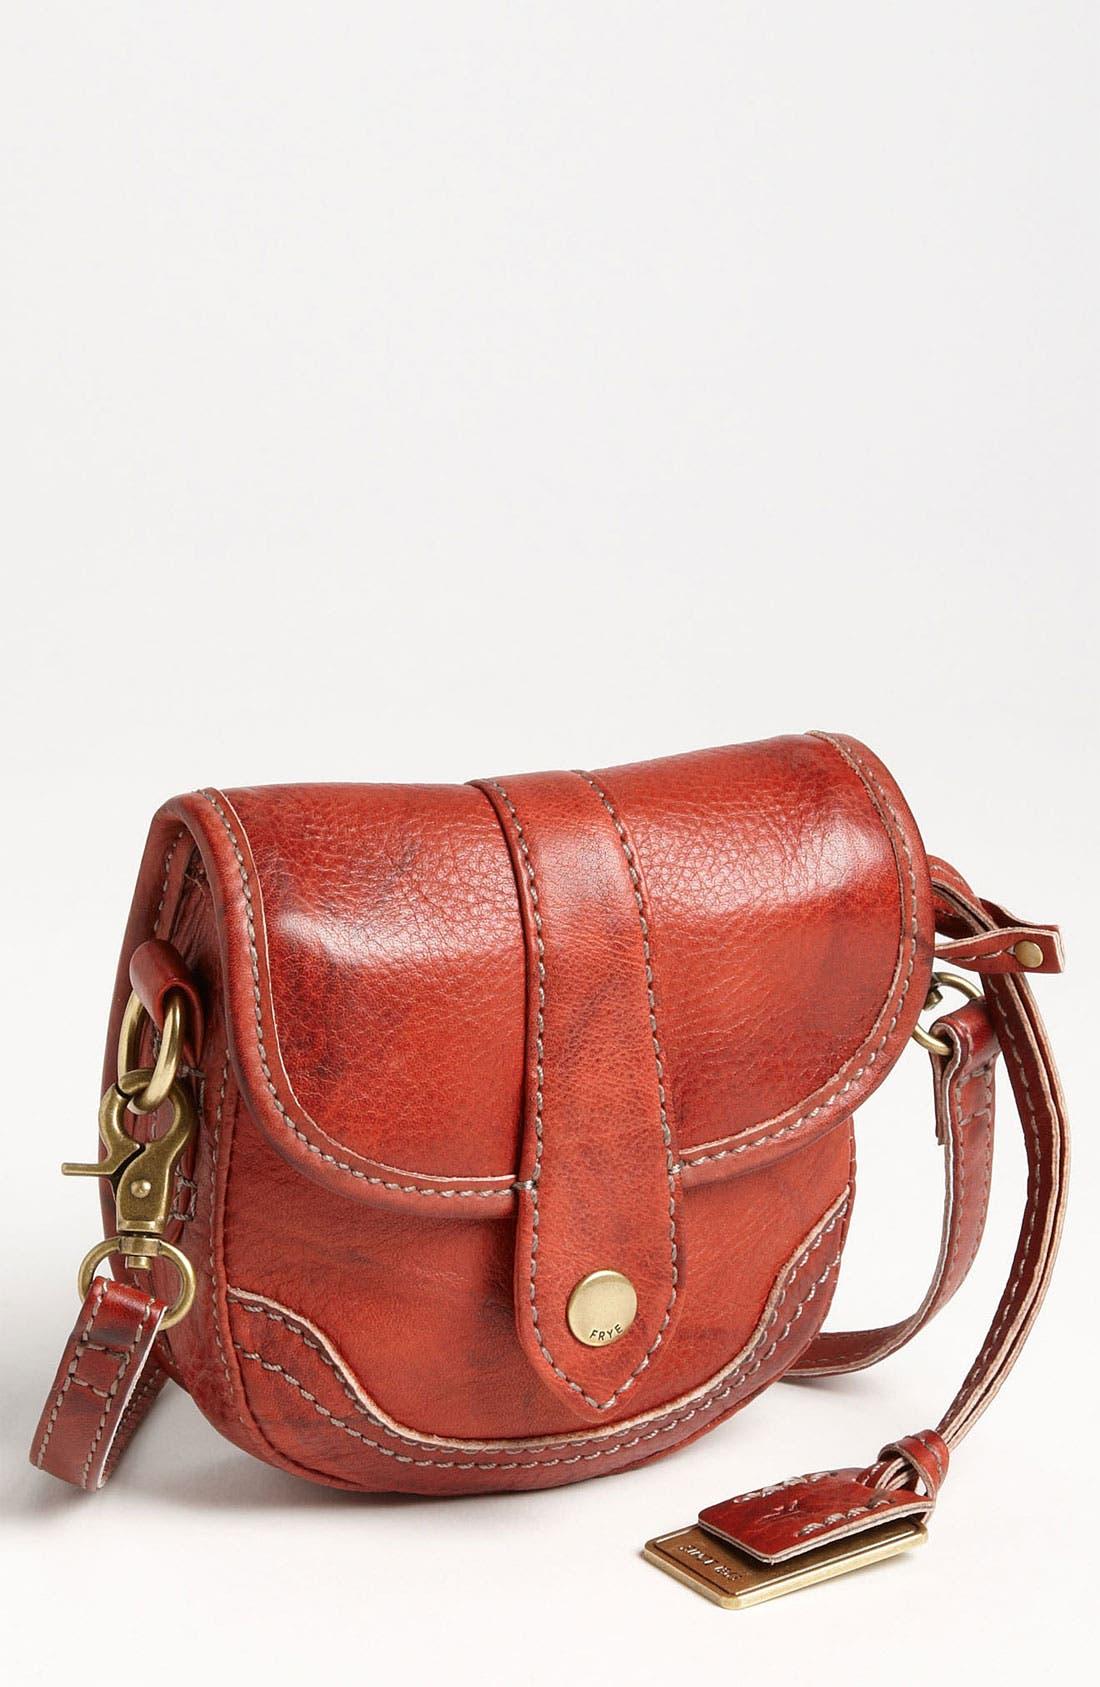 Main Image - Frye 'Campus - Mini' Crossbody Bag